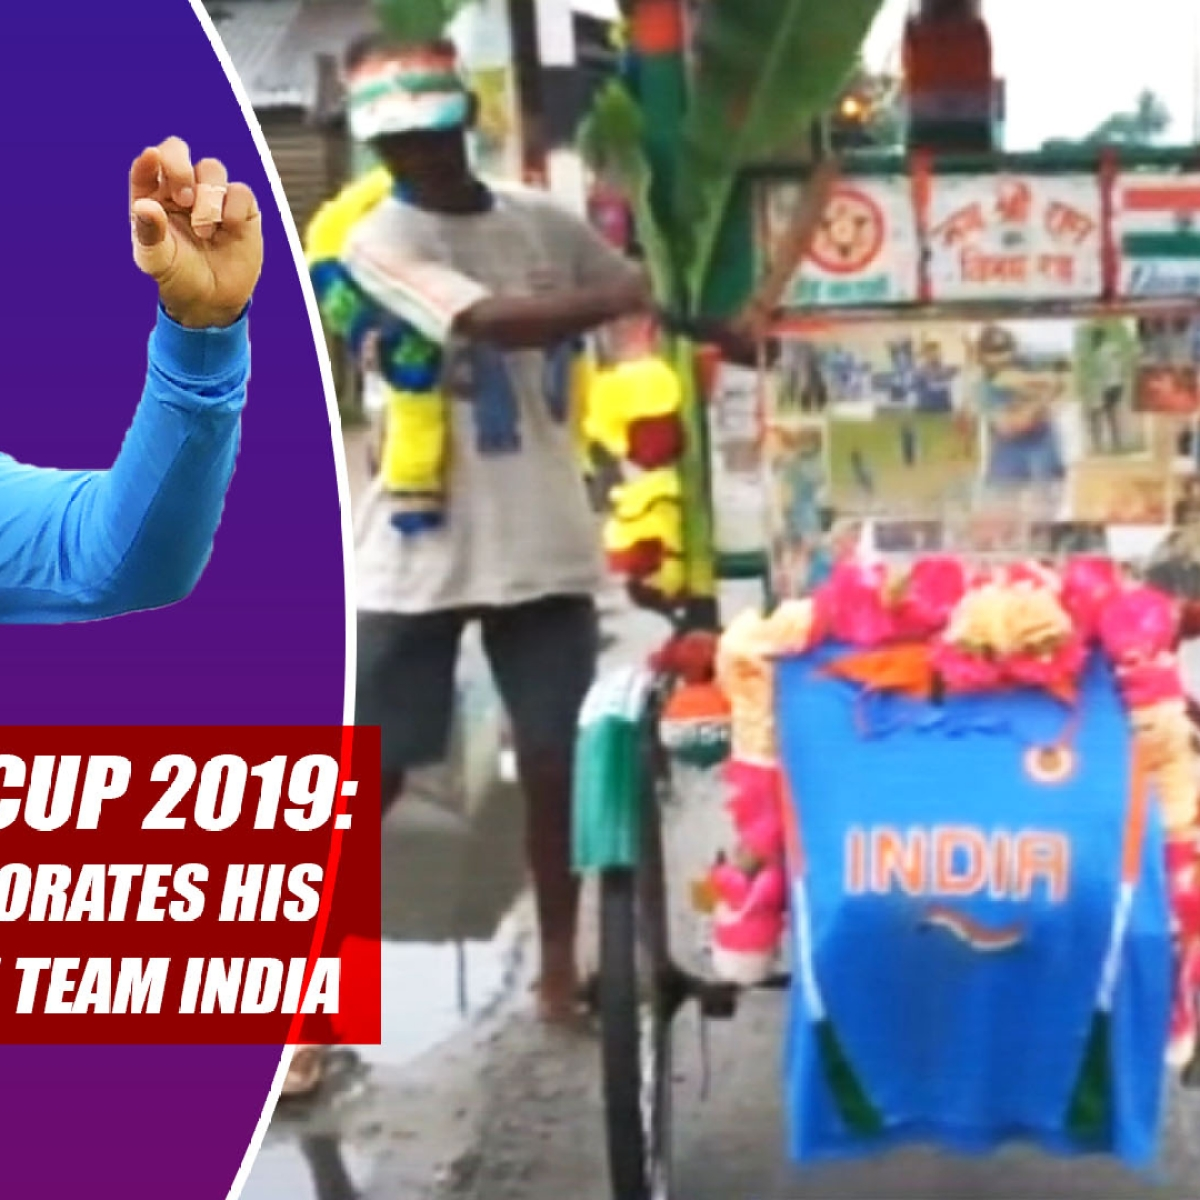 Cricket World Cup 2019: Rickshaw Puller Decorates His Rickshaw To Motivate Team India